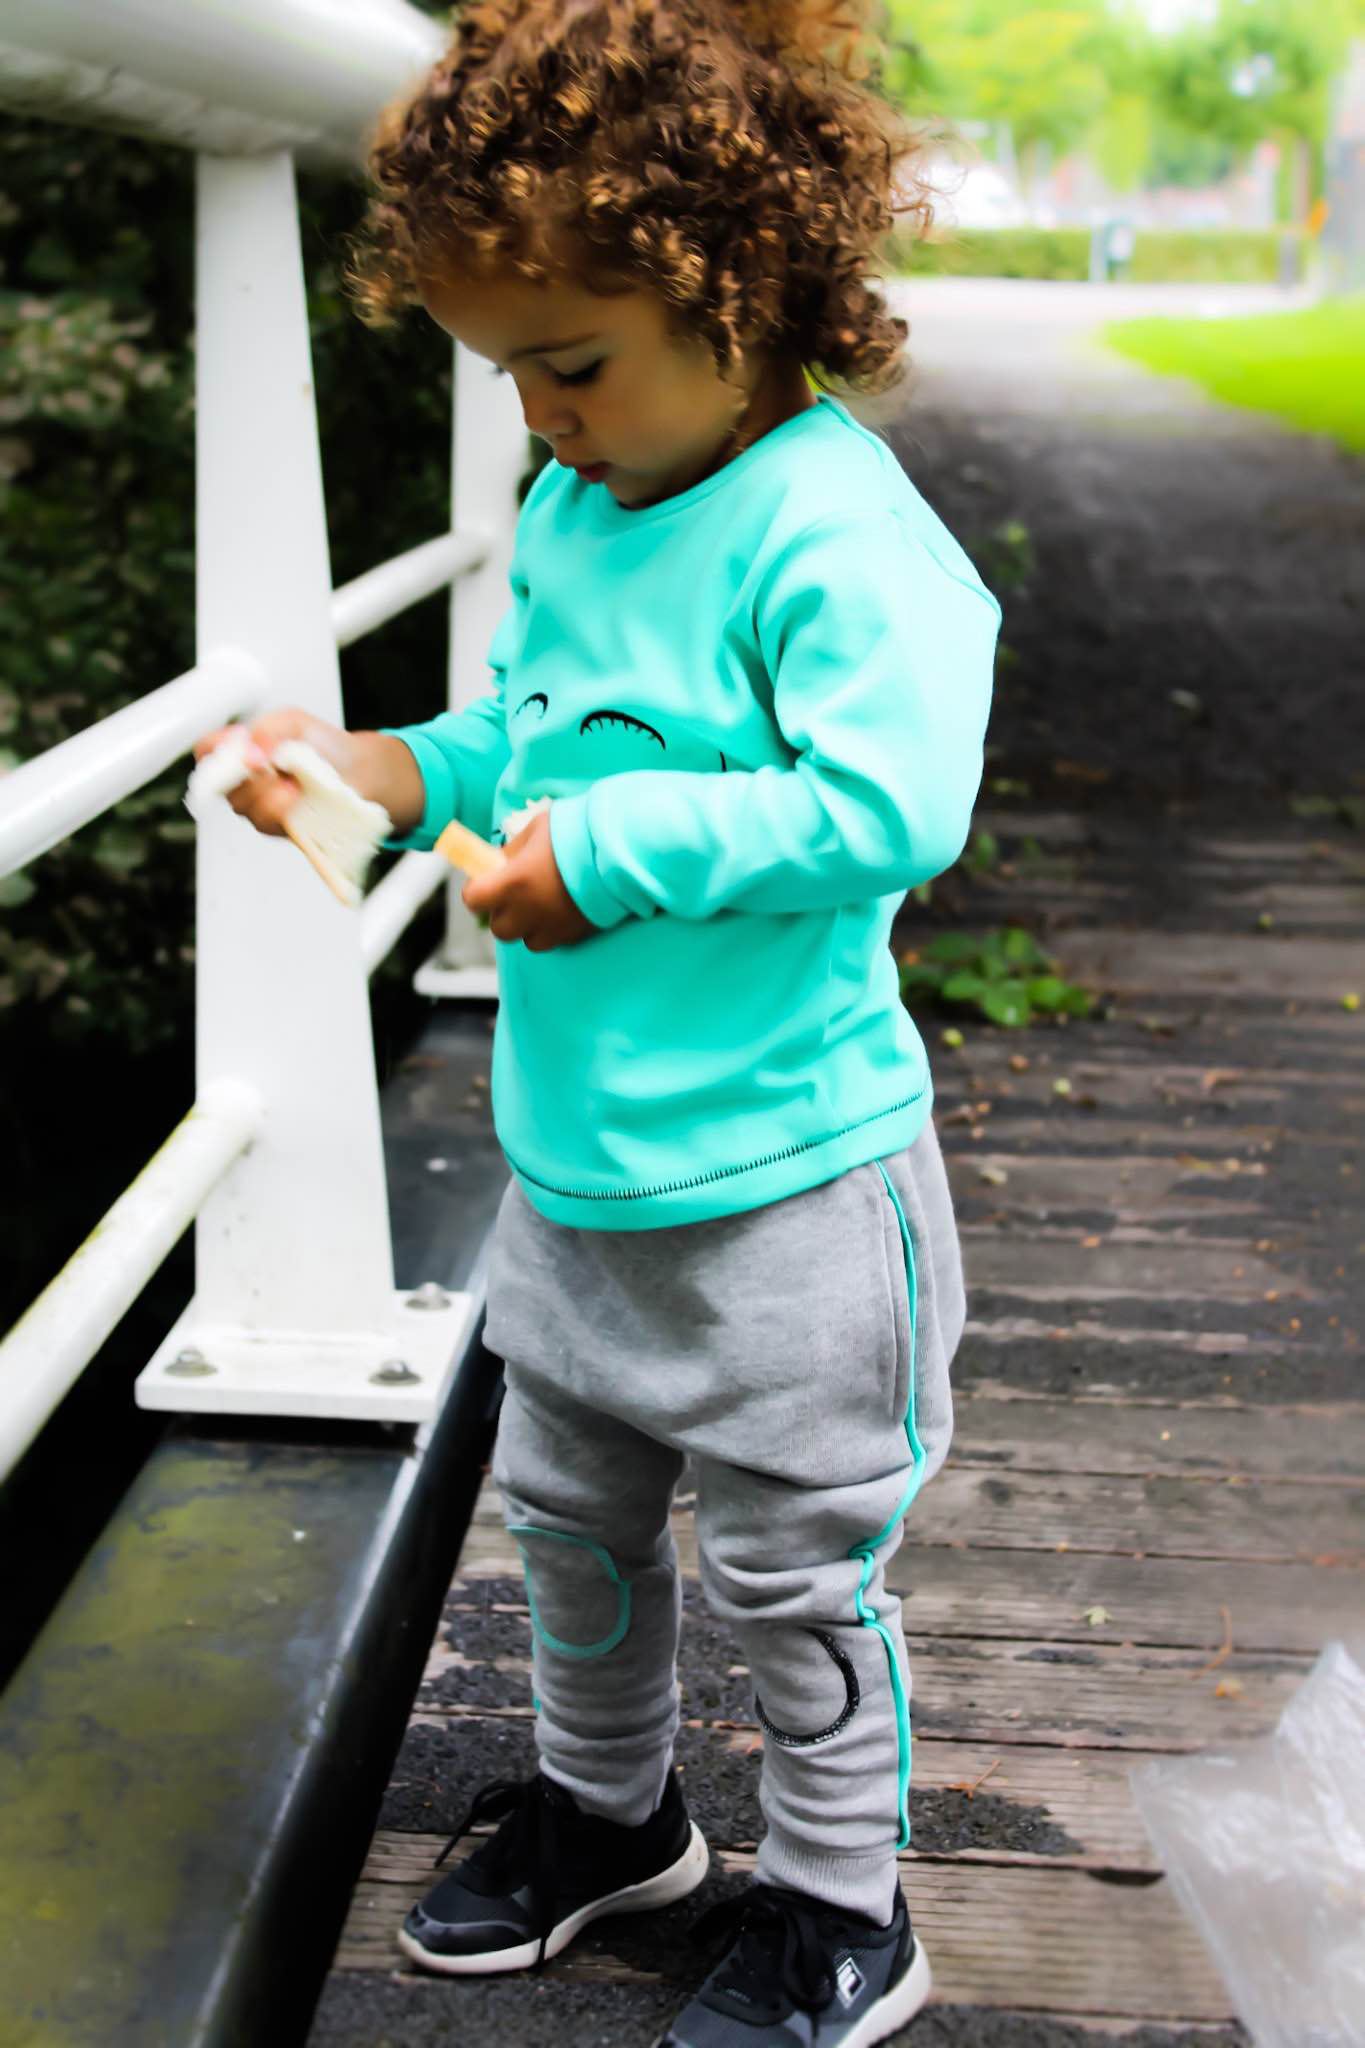 Review Kinderkleding.Qtie Kinderkleding Review Qtie Babylabel